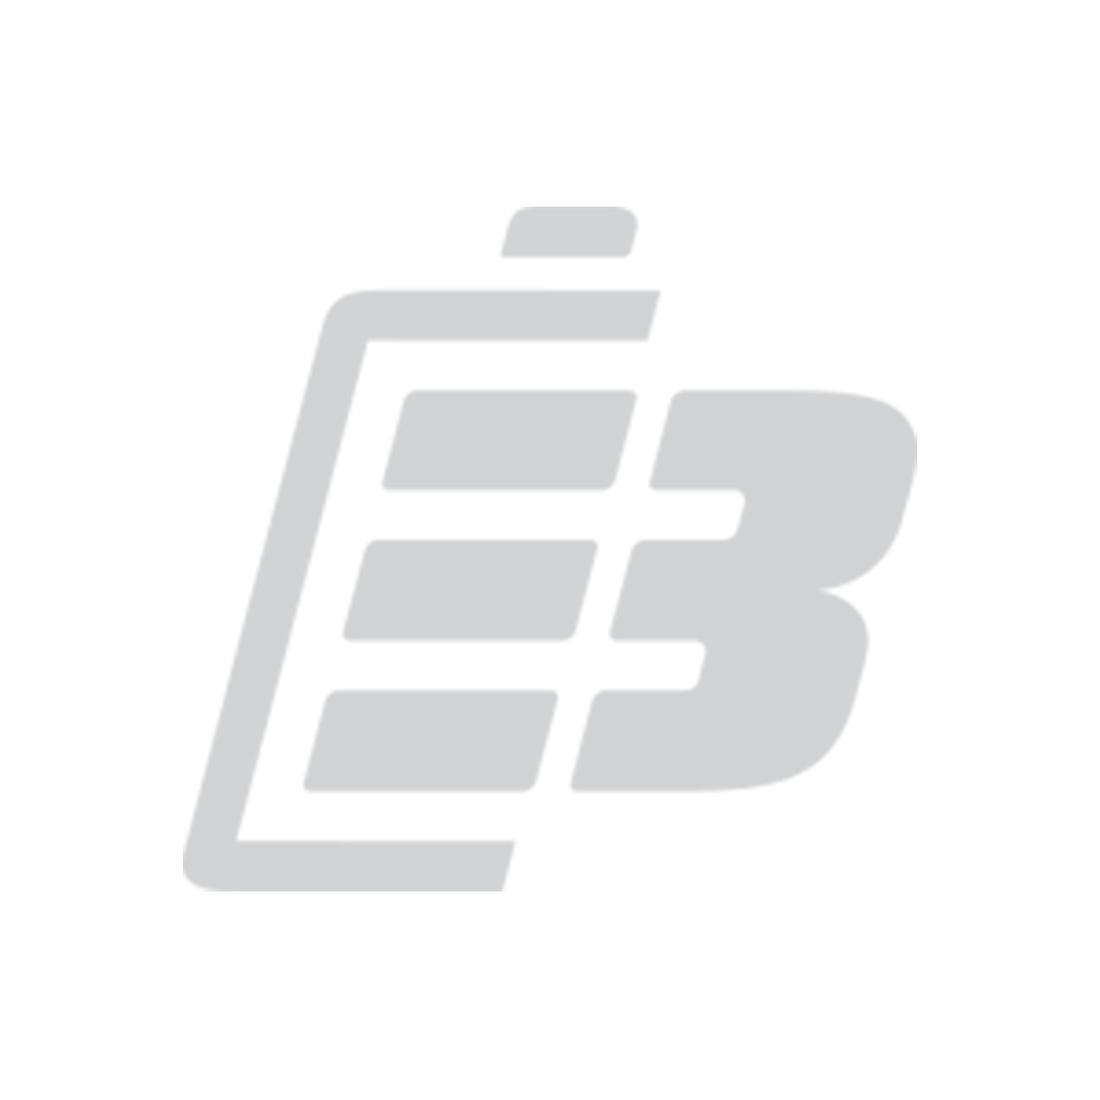 Fenix E03R KeyChain LED Flashlight